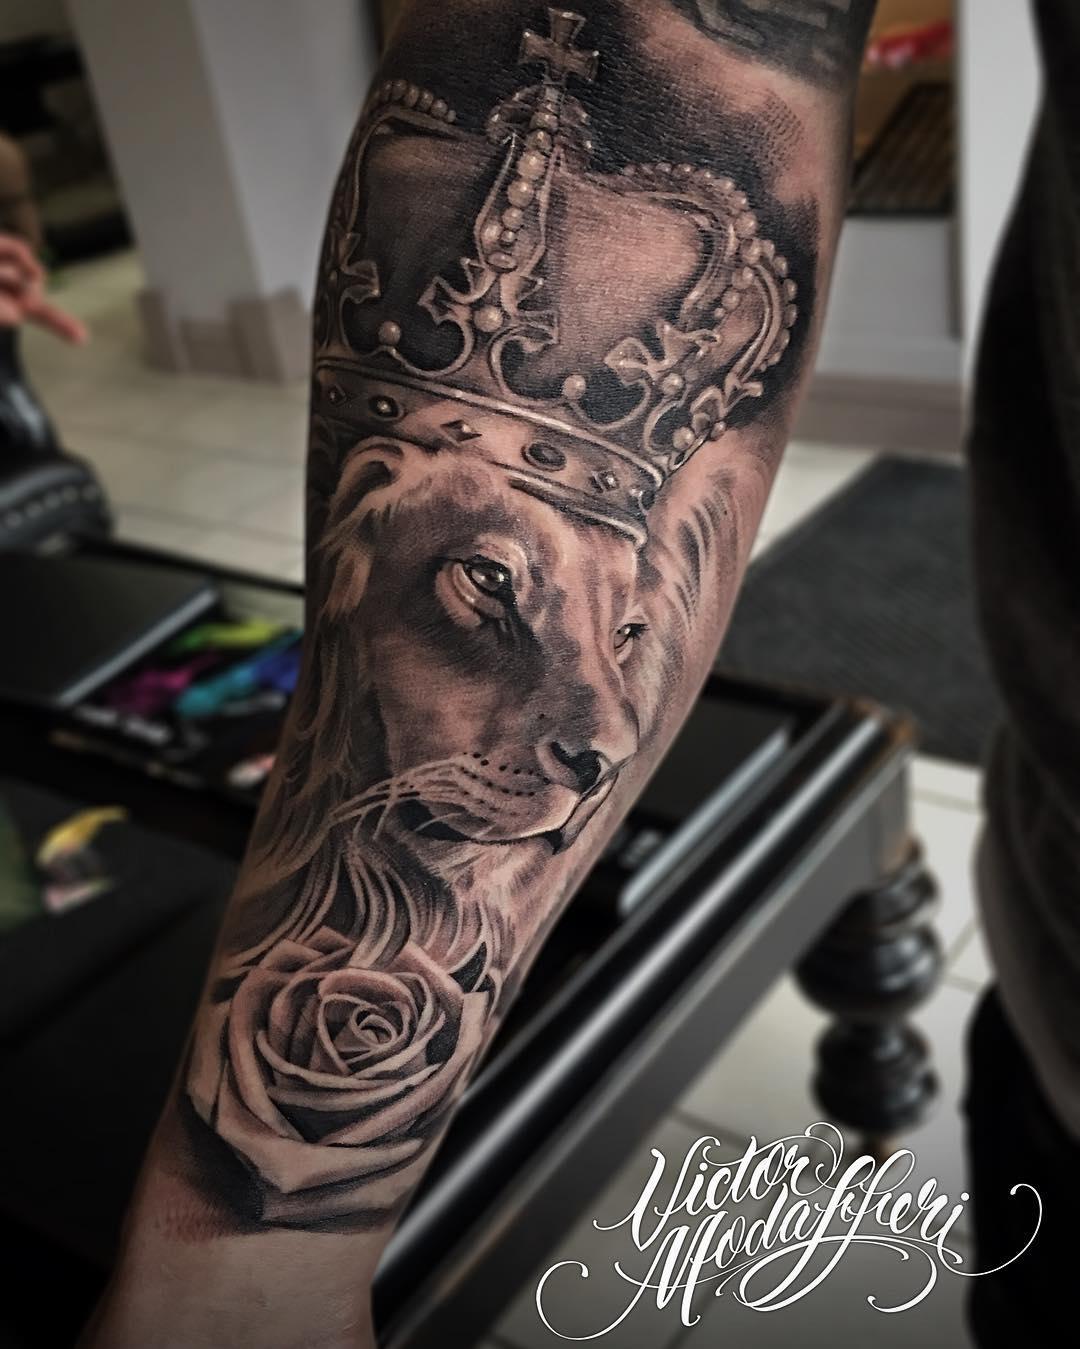 Victor modafferi bullseye tattoo shop for Tattoo clothing shop